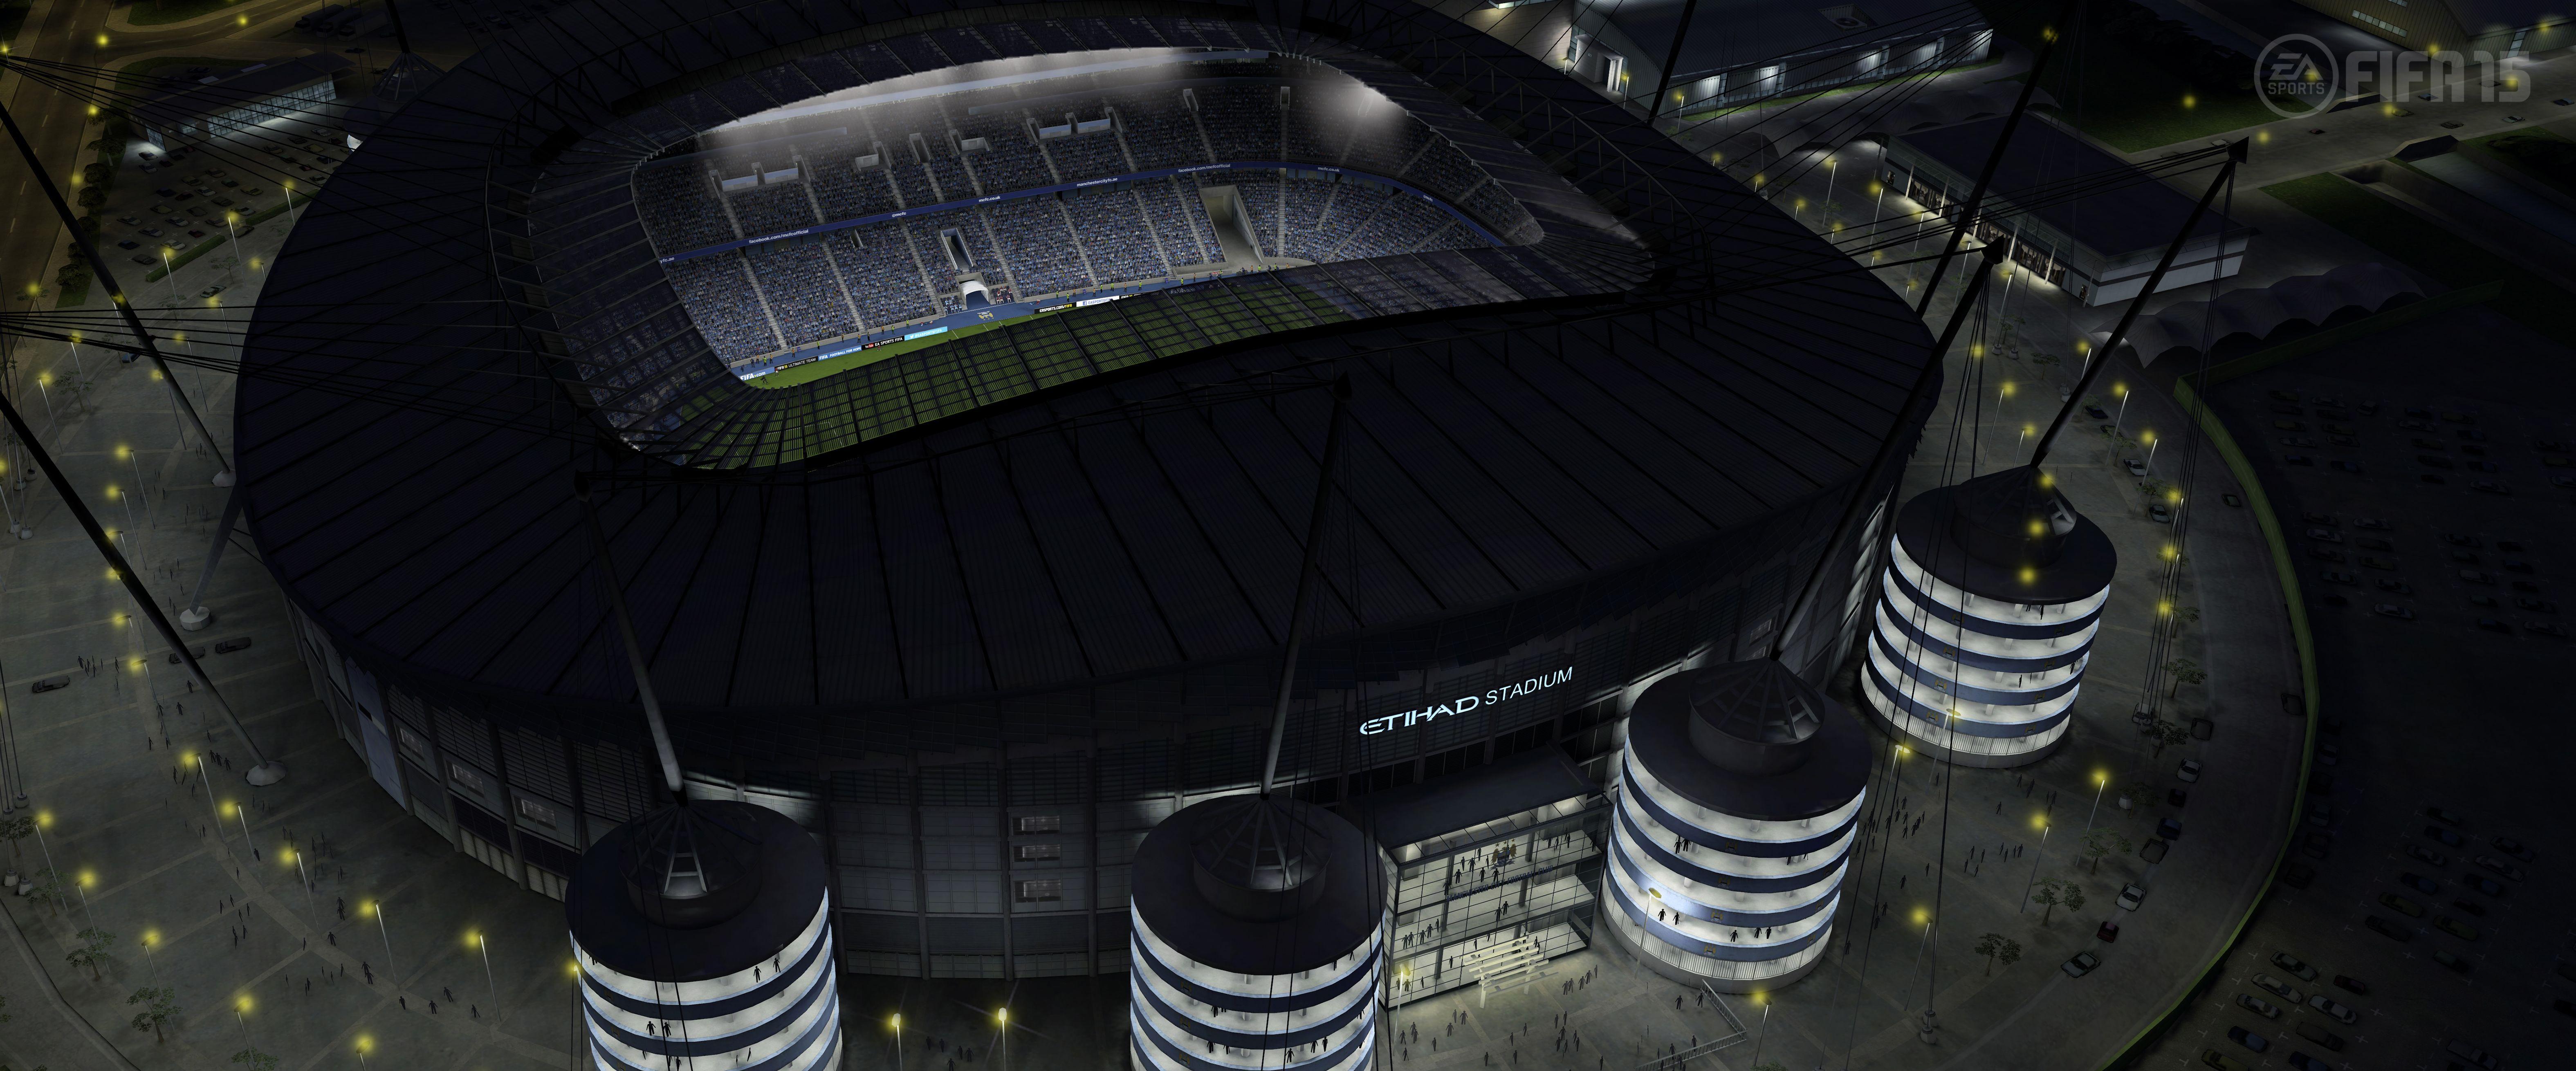 Etihad FIFA 15 by EA Sports English football stadiums